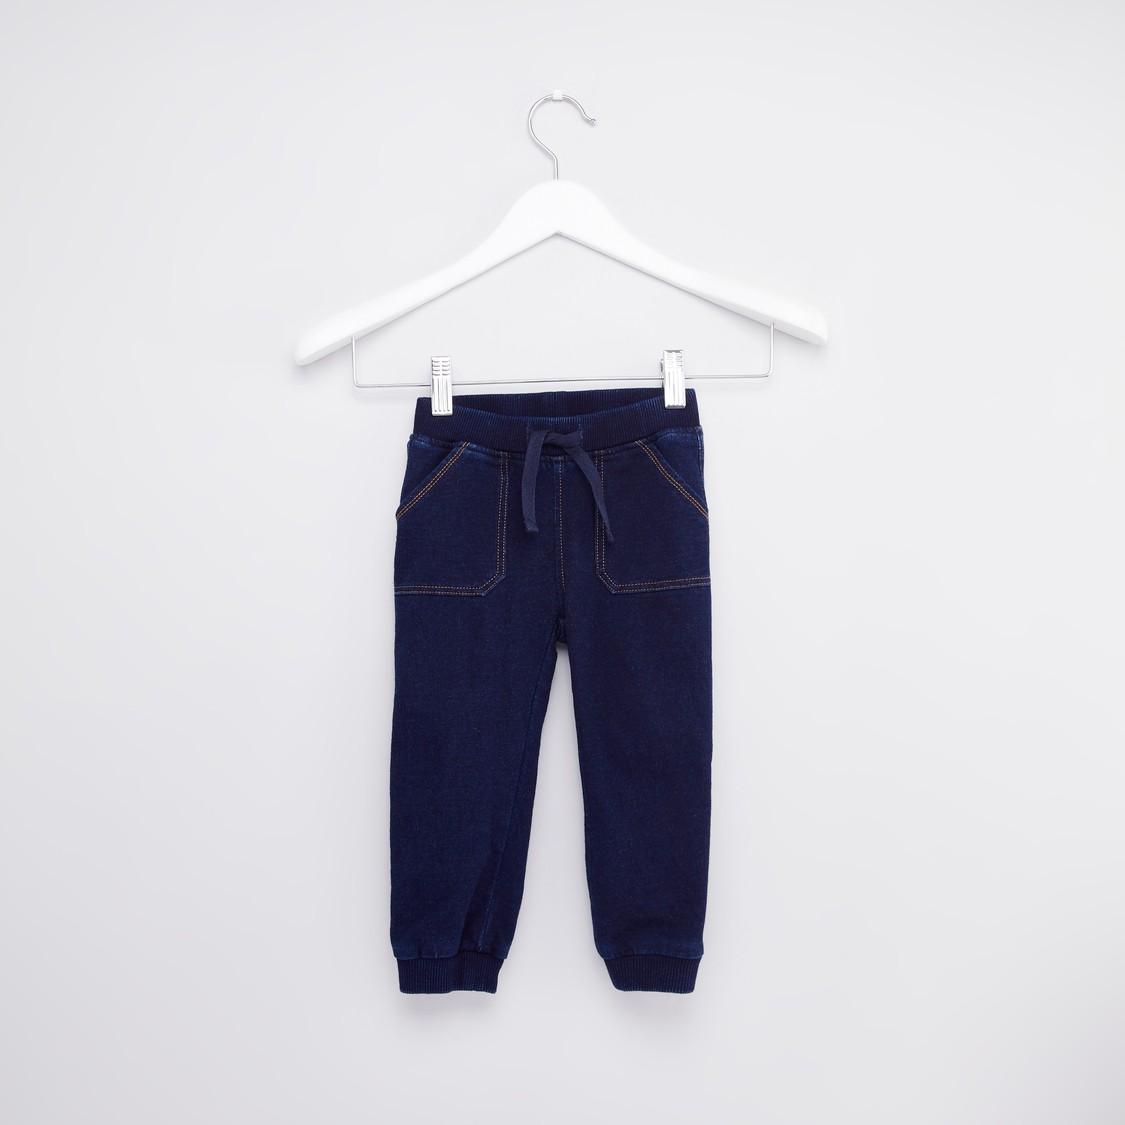 Full Length Denim Jog Pants with Pocket Detail and Drawstring